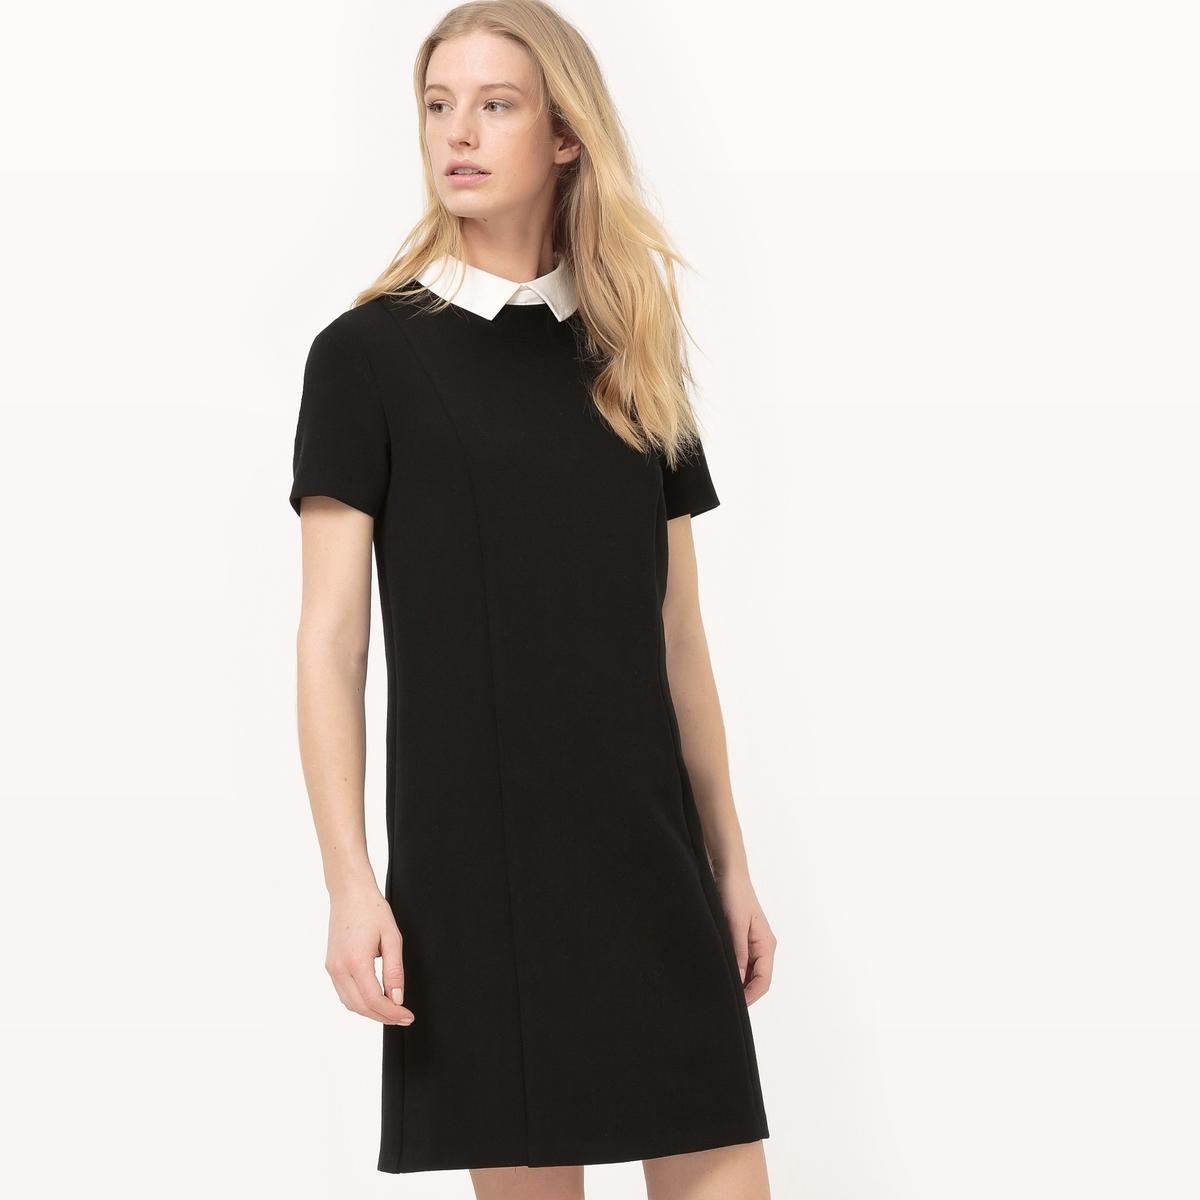 Платье-футляр с контрастным воротником платье футляр